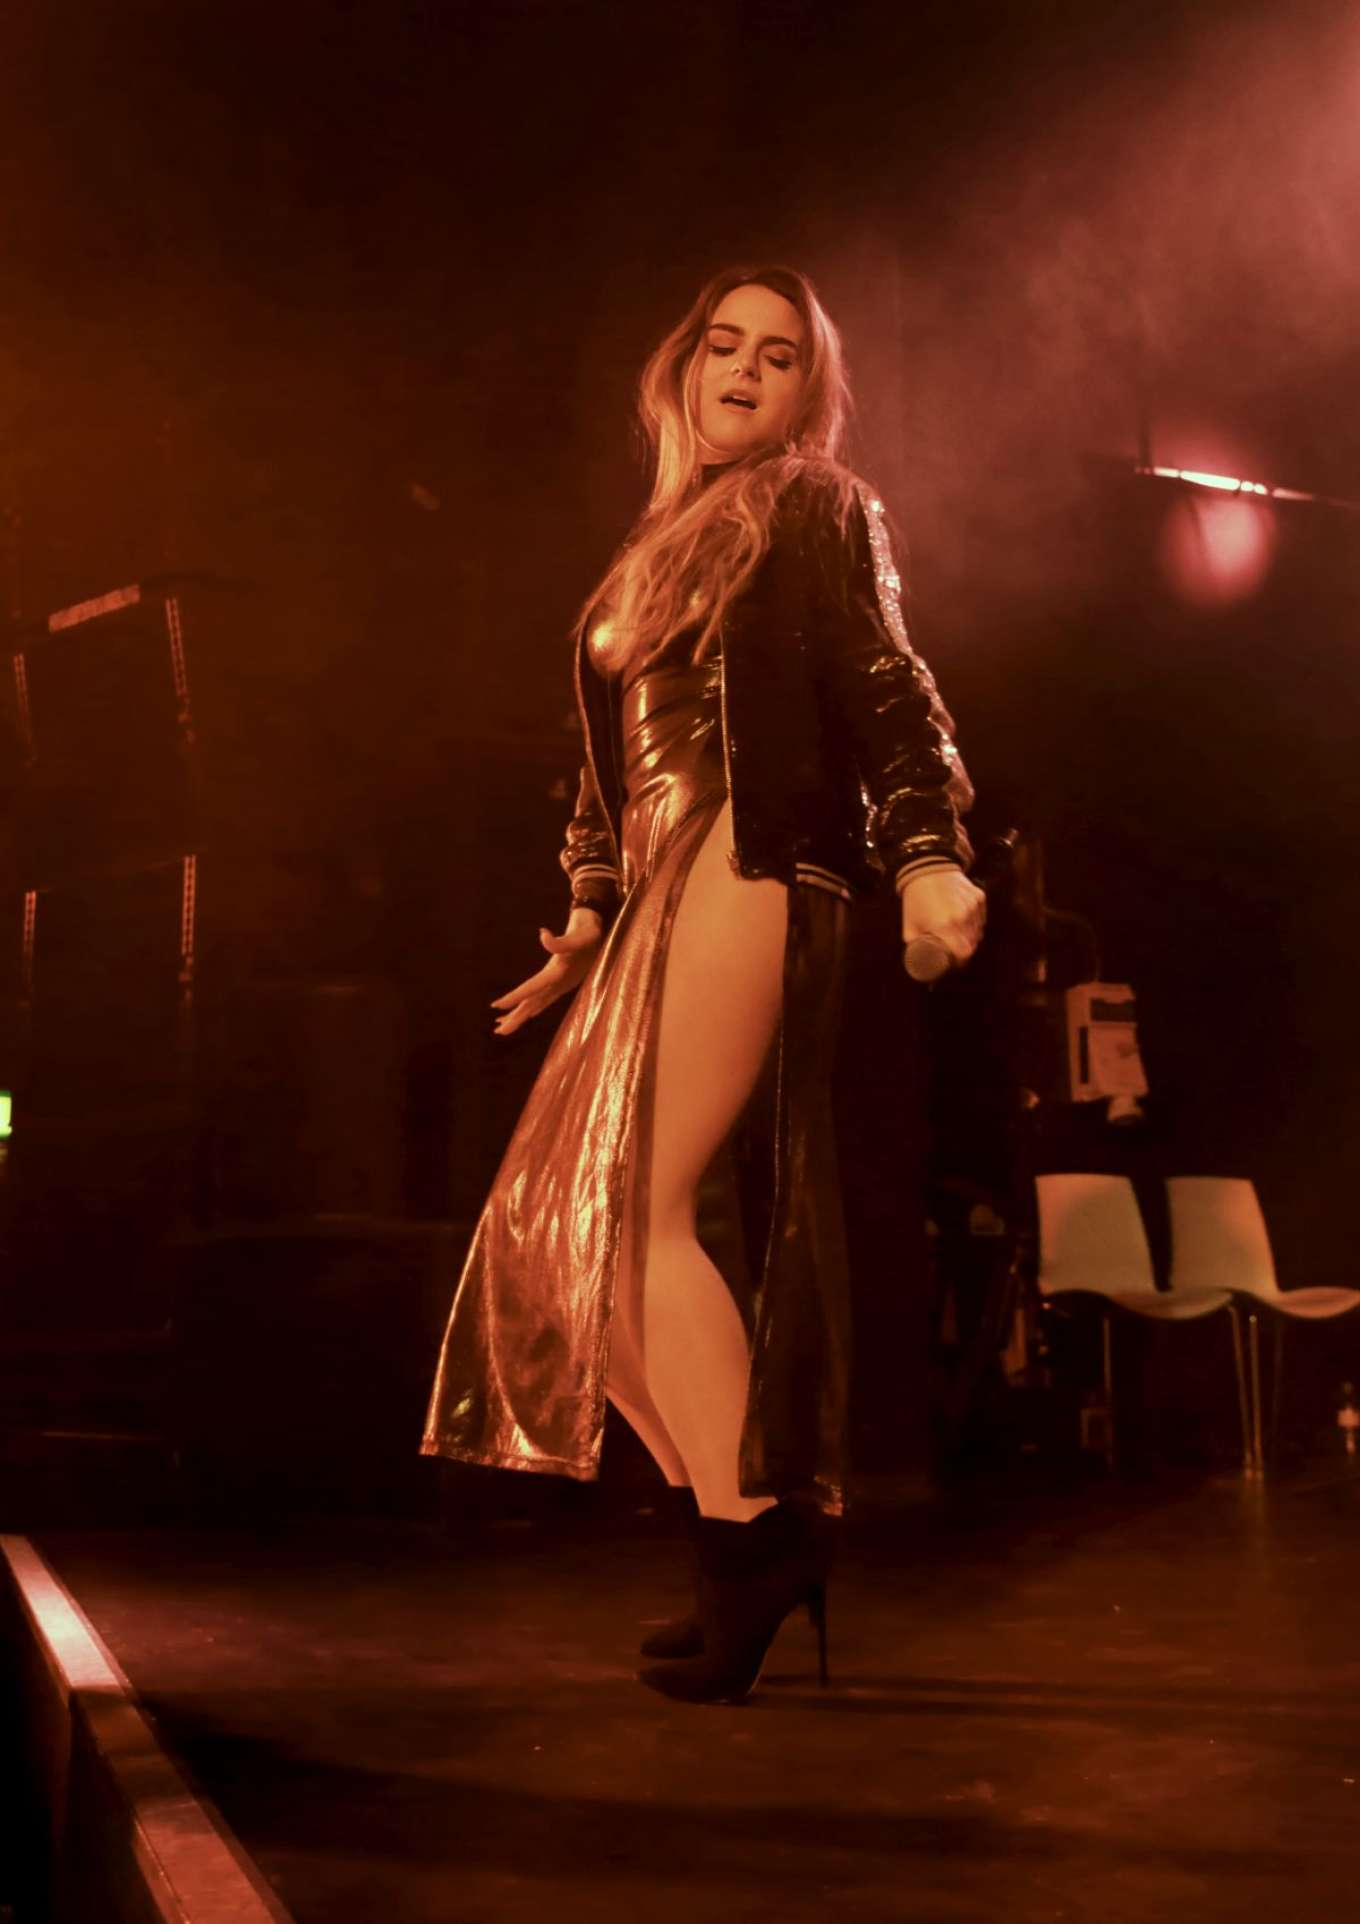 Joanna Jojo Levesque - Performs iIn Manchester